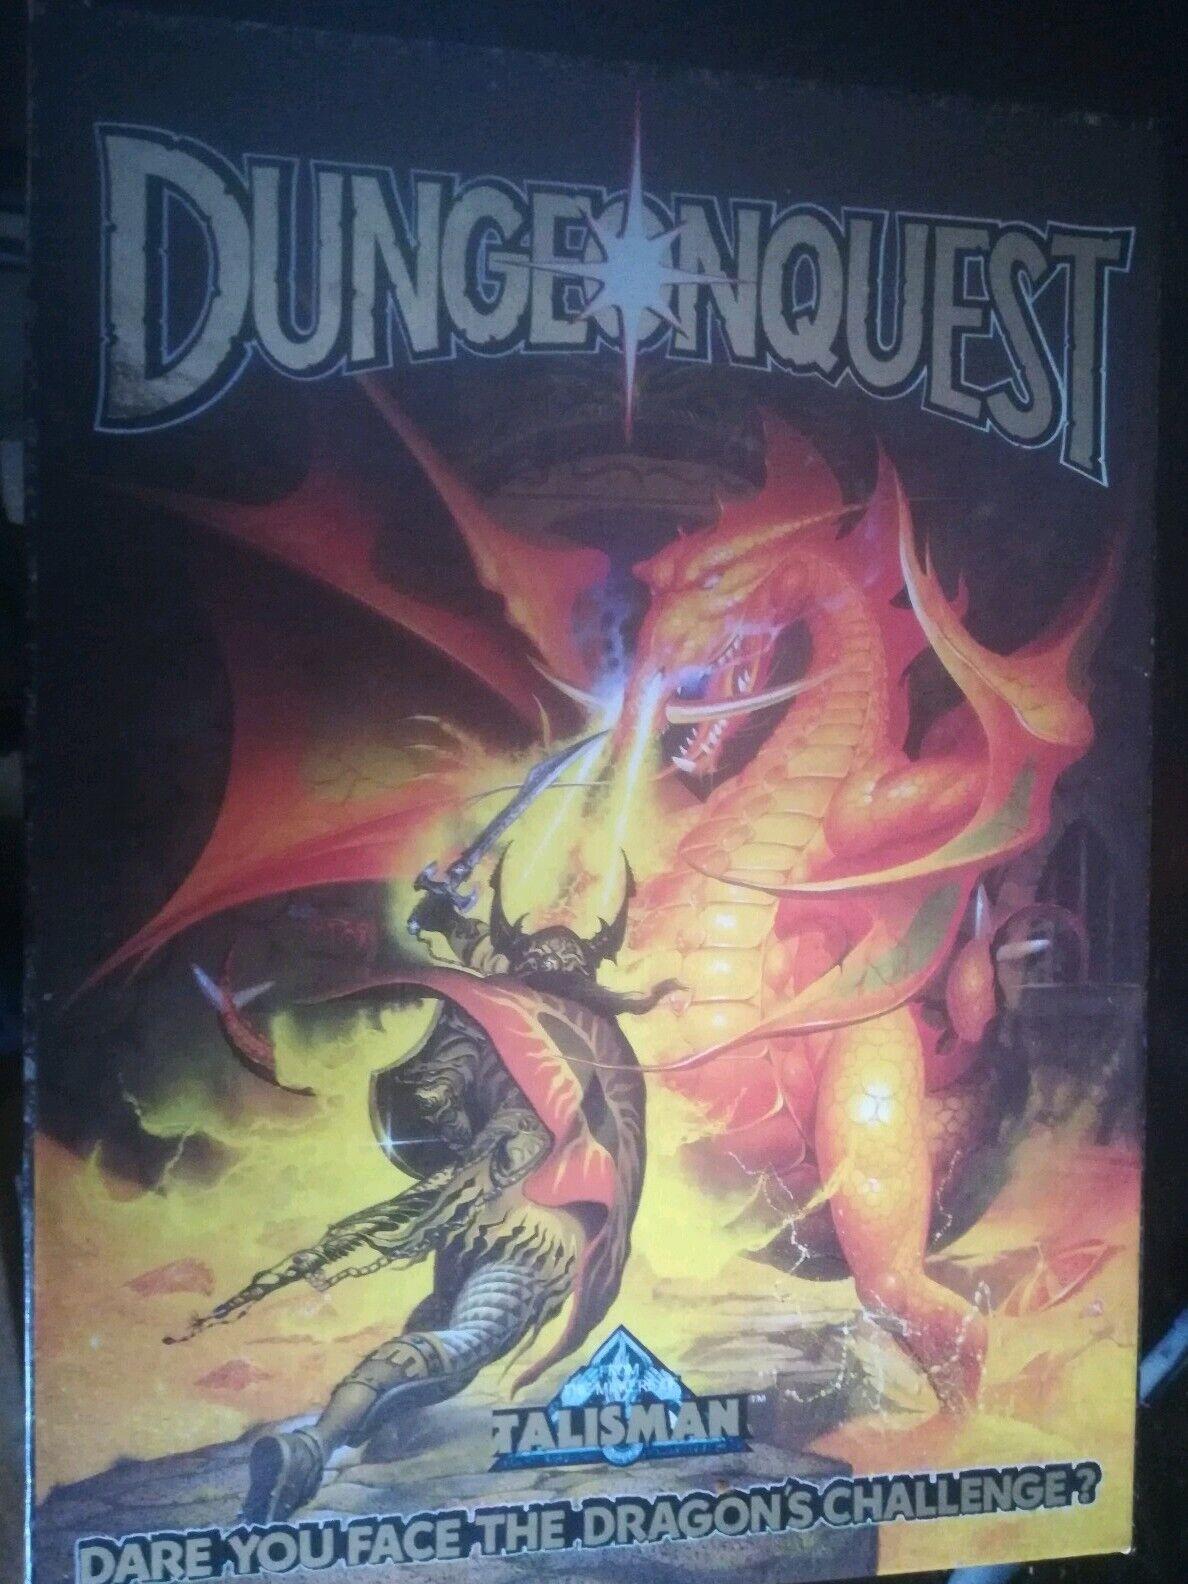 Dungeonquest   Dungeon Dungeon Dungeon Quest   GW   Games Workshop   Rar    Talisman Designer e64418